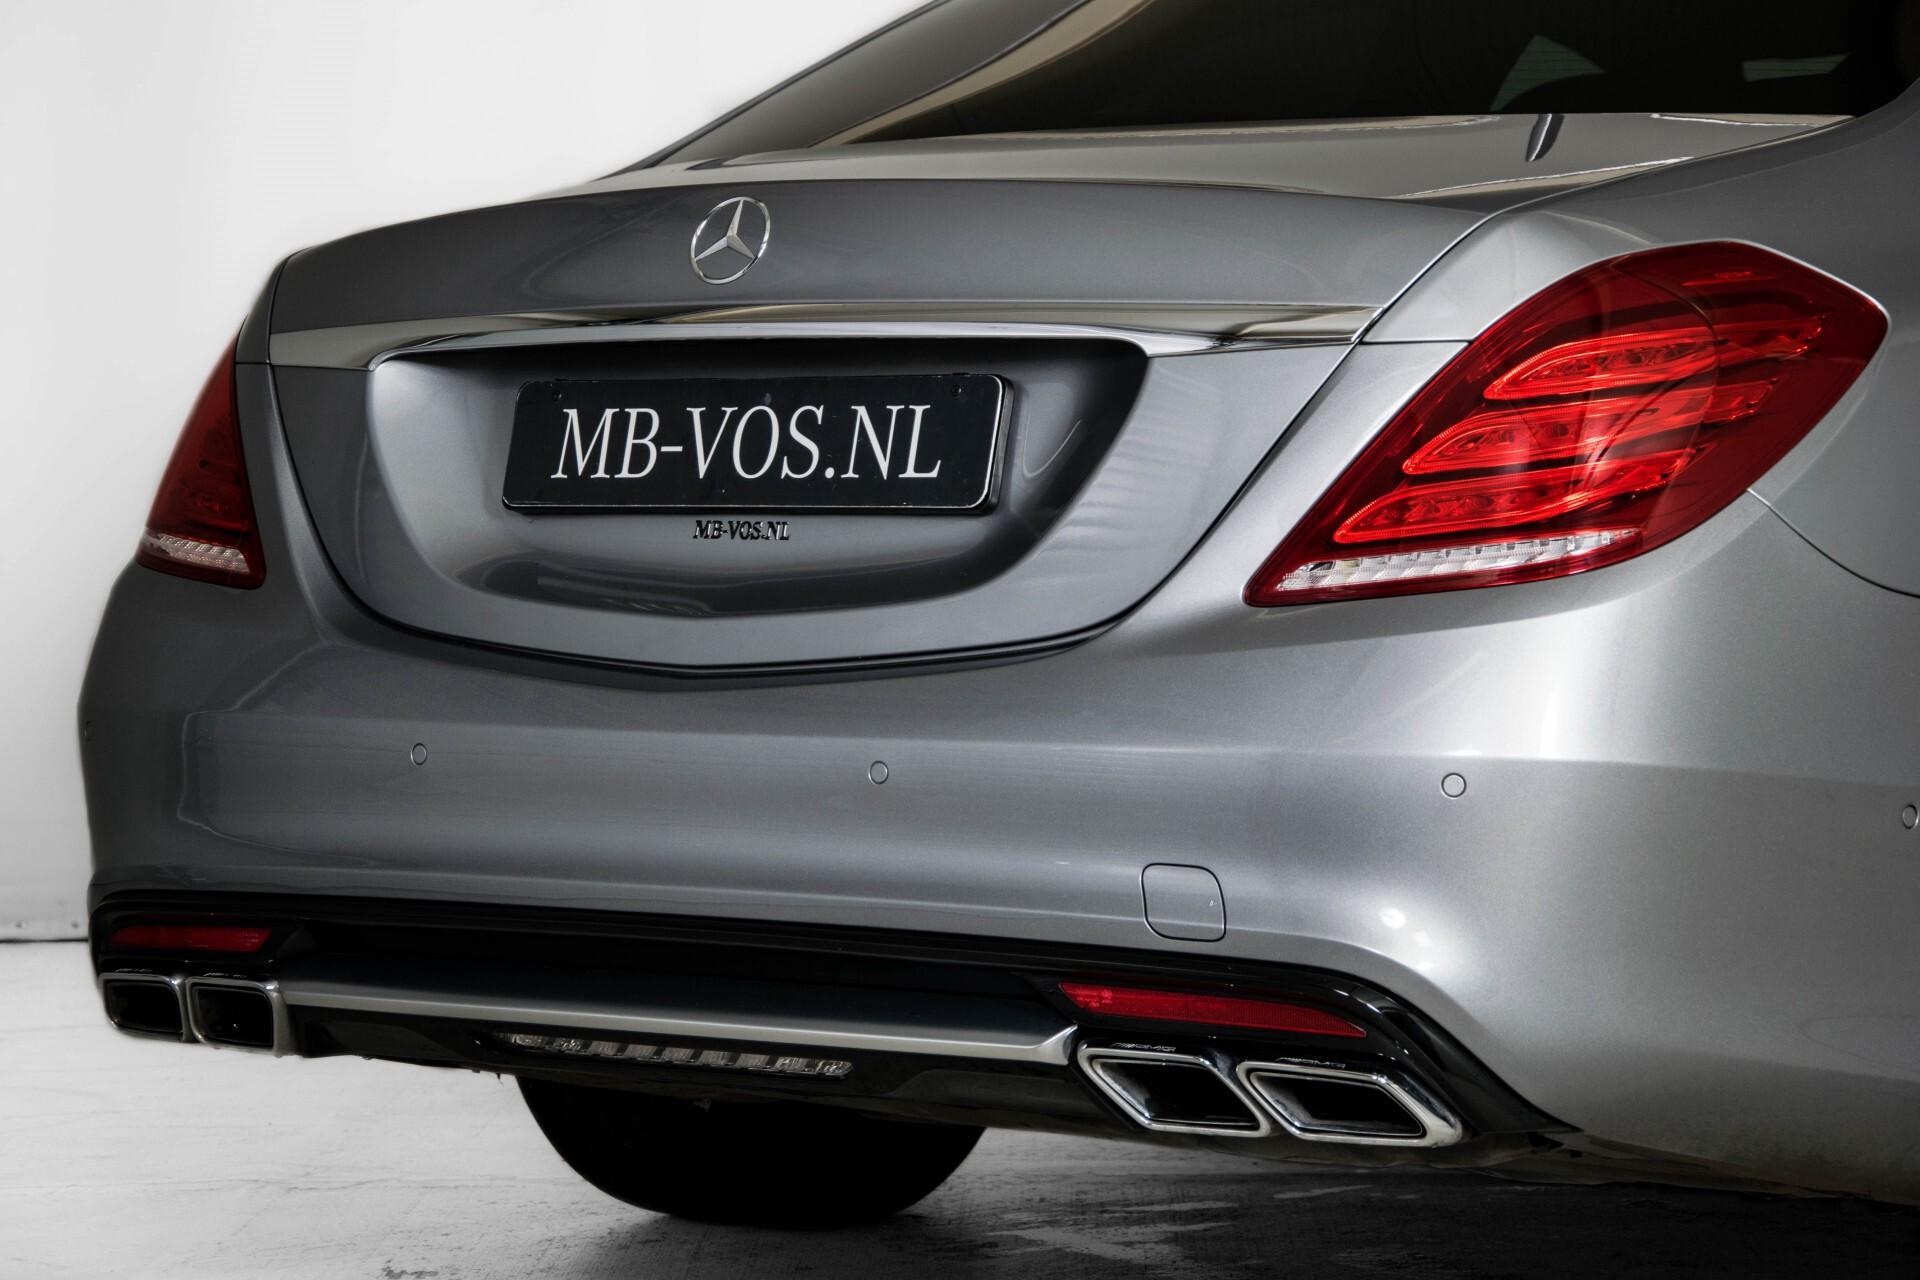 Mercedes-Benz S-Klasse 350 BlueTEC 63 AMG Panorama/Distronic/Keyless/Massage/Burmester Aut7 Foto 41